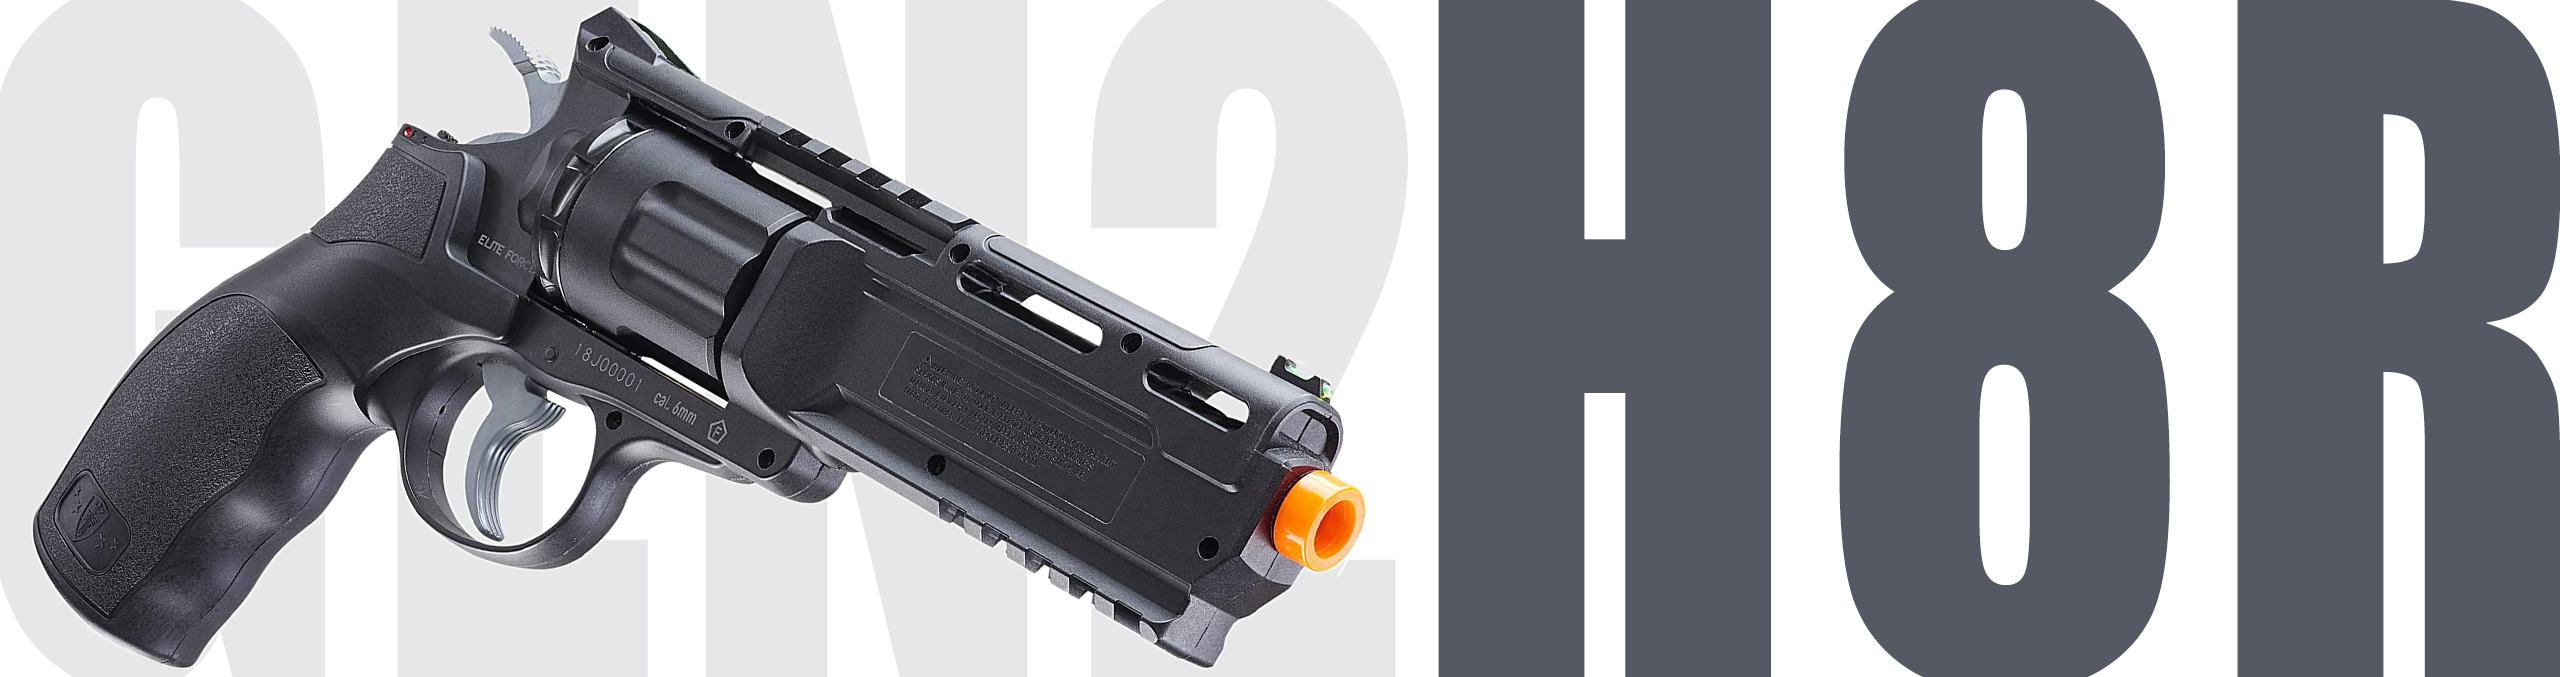 Elite Force by Umarex H8R Gen2 CO2 Powered Airsoft Revolver